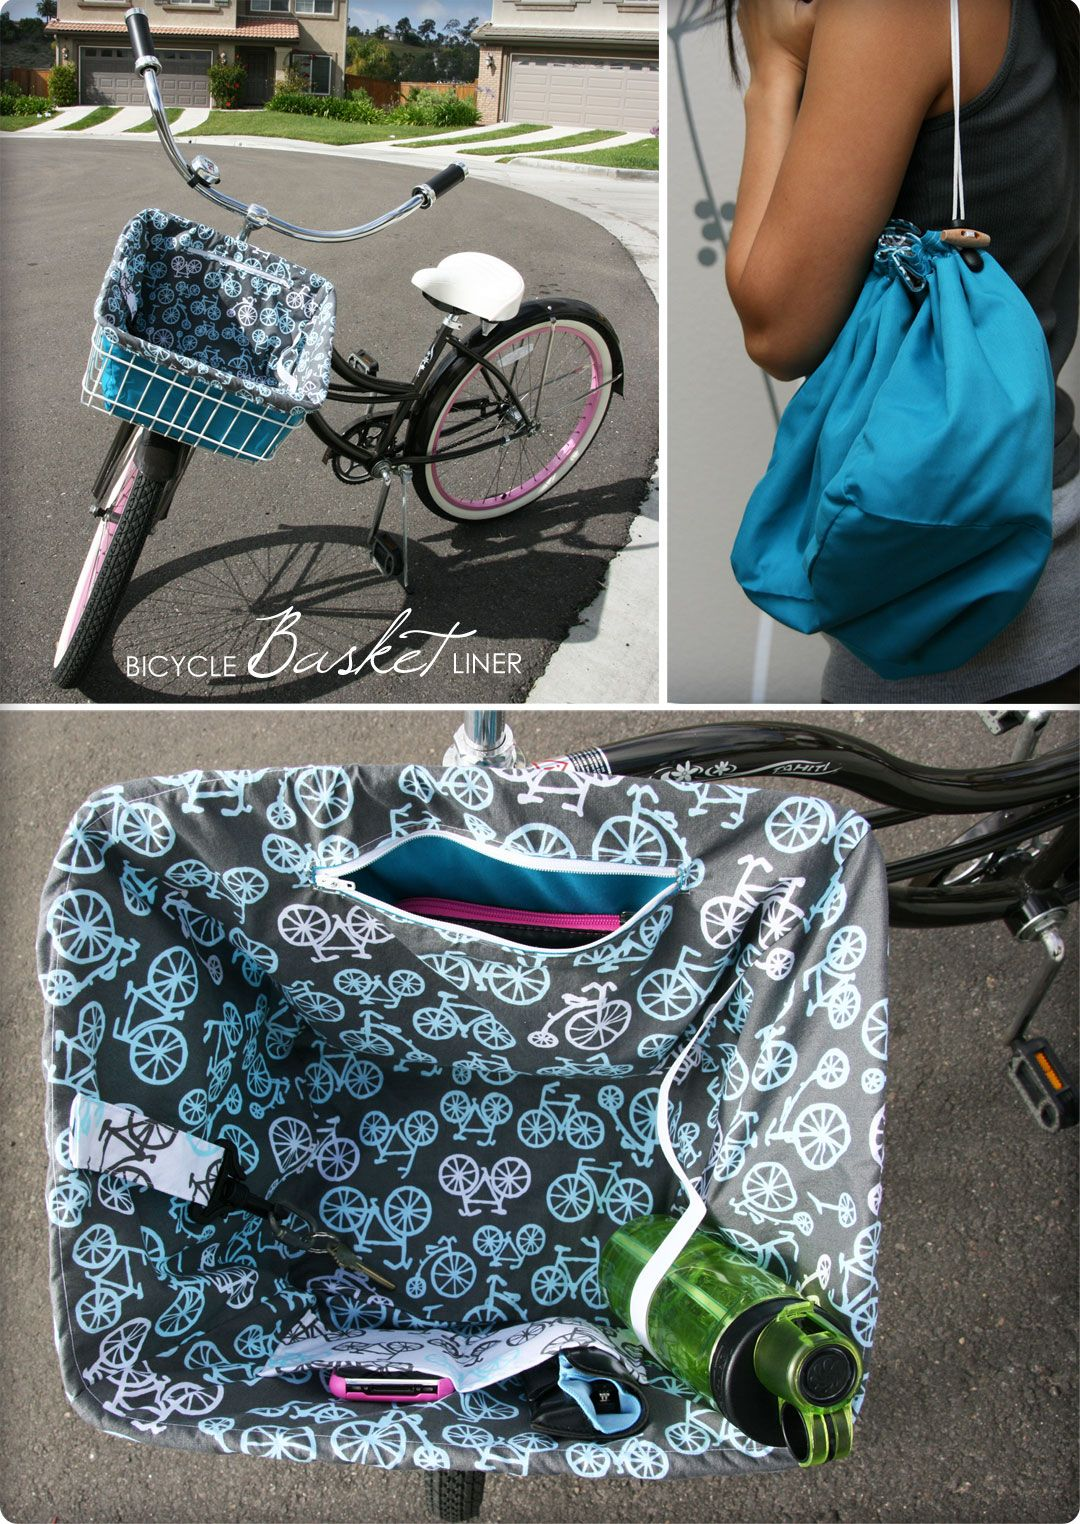 Nähen - Tasche - Fahrrad - abnehmbar - bicycle_basket_liner | Nähen ...